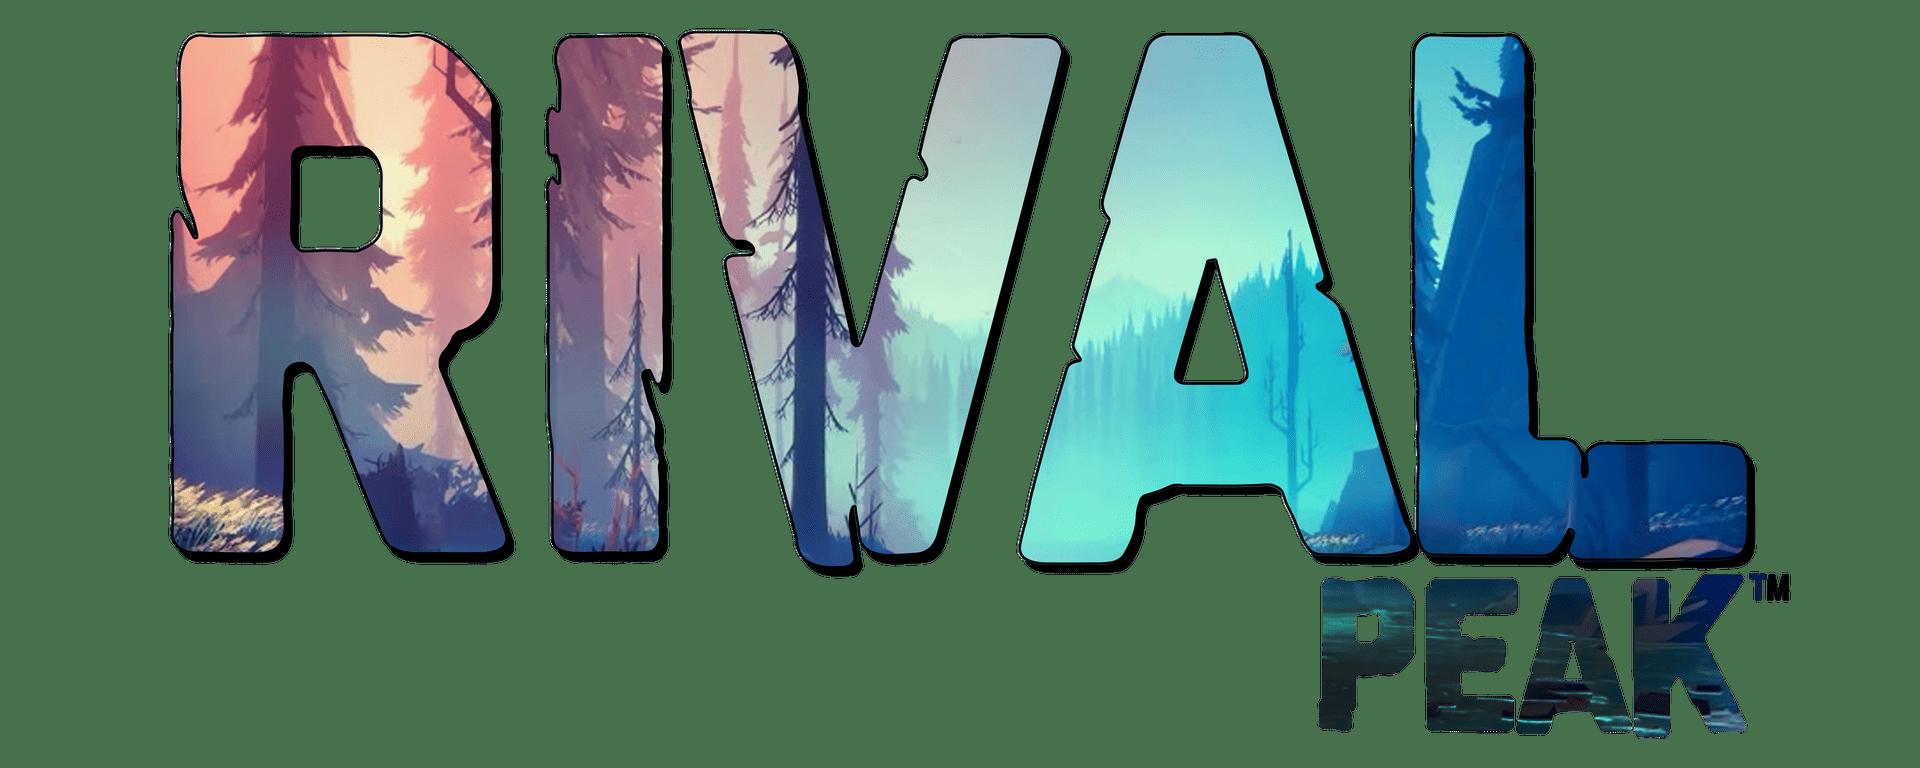 Rival Peak Logo